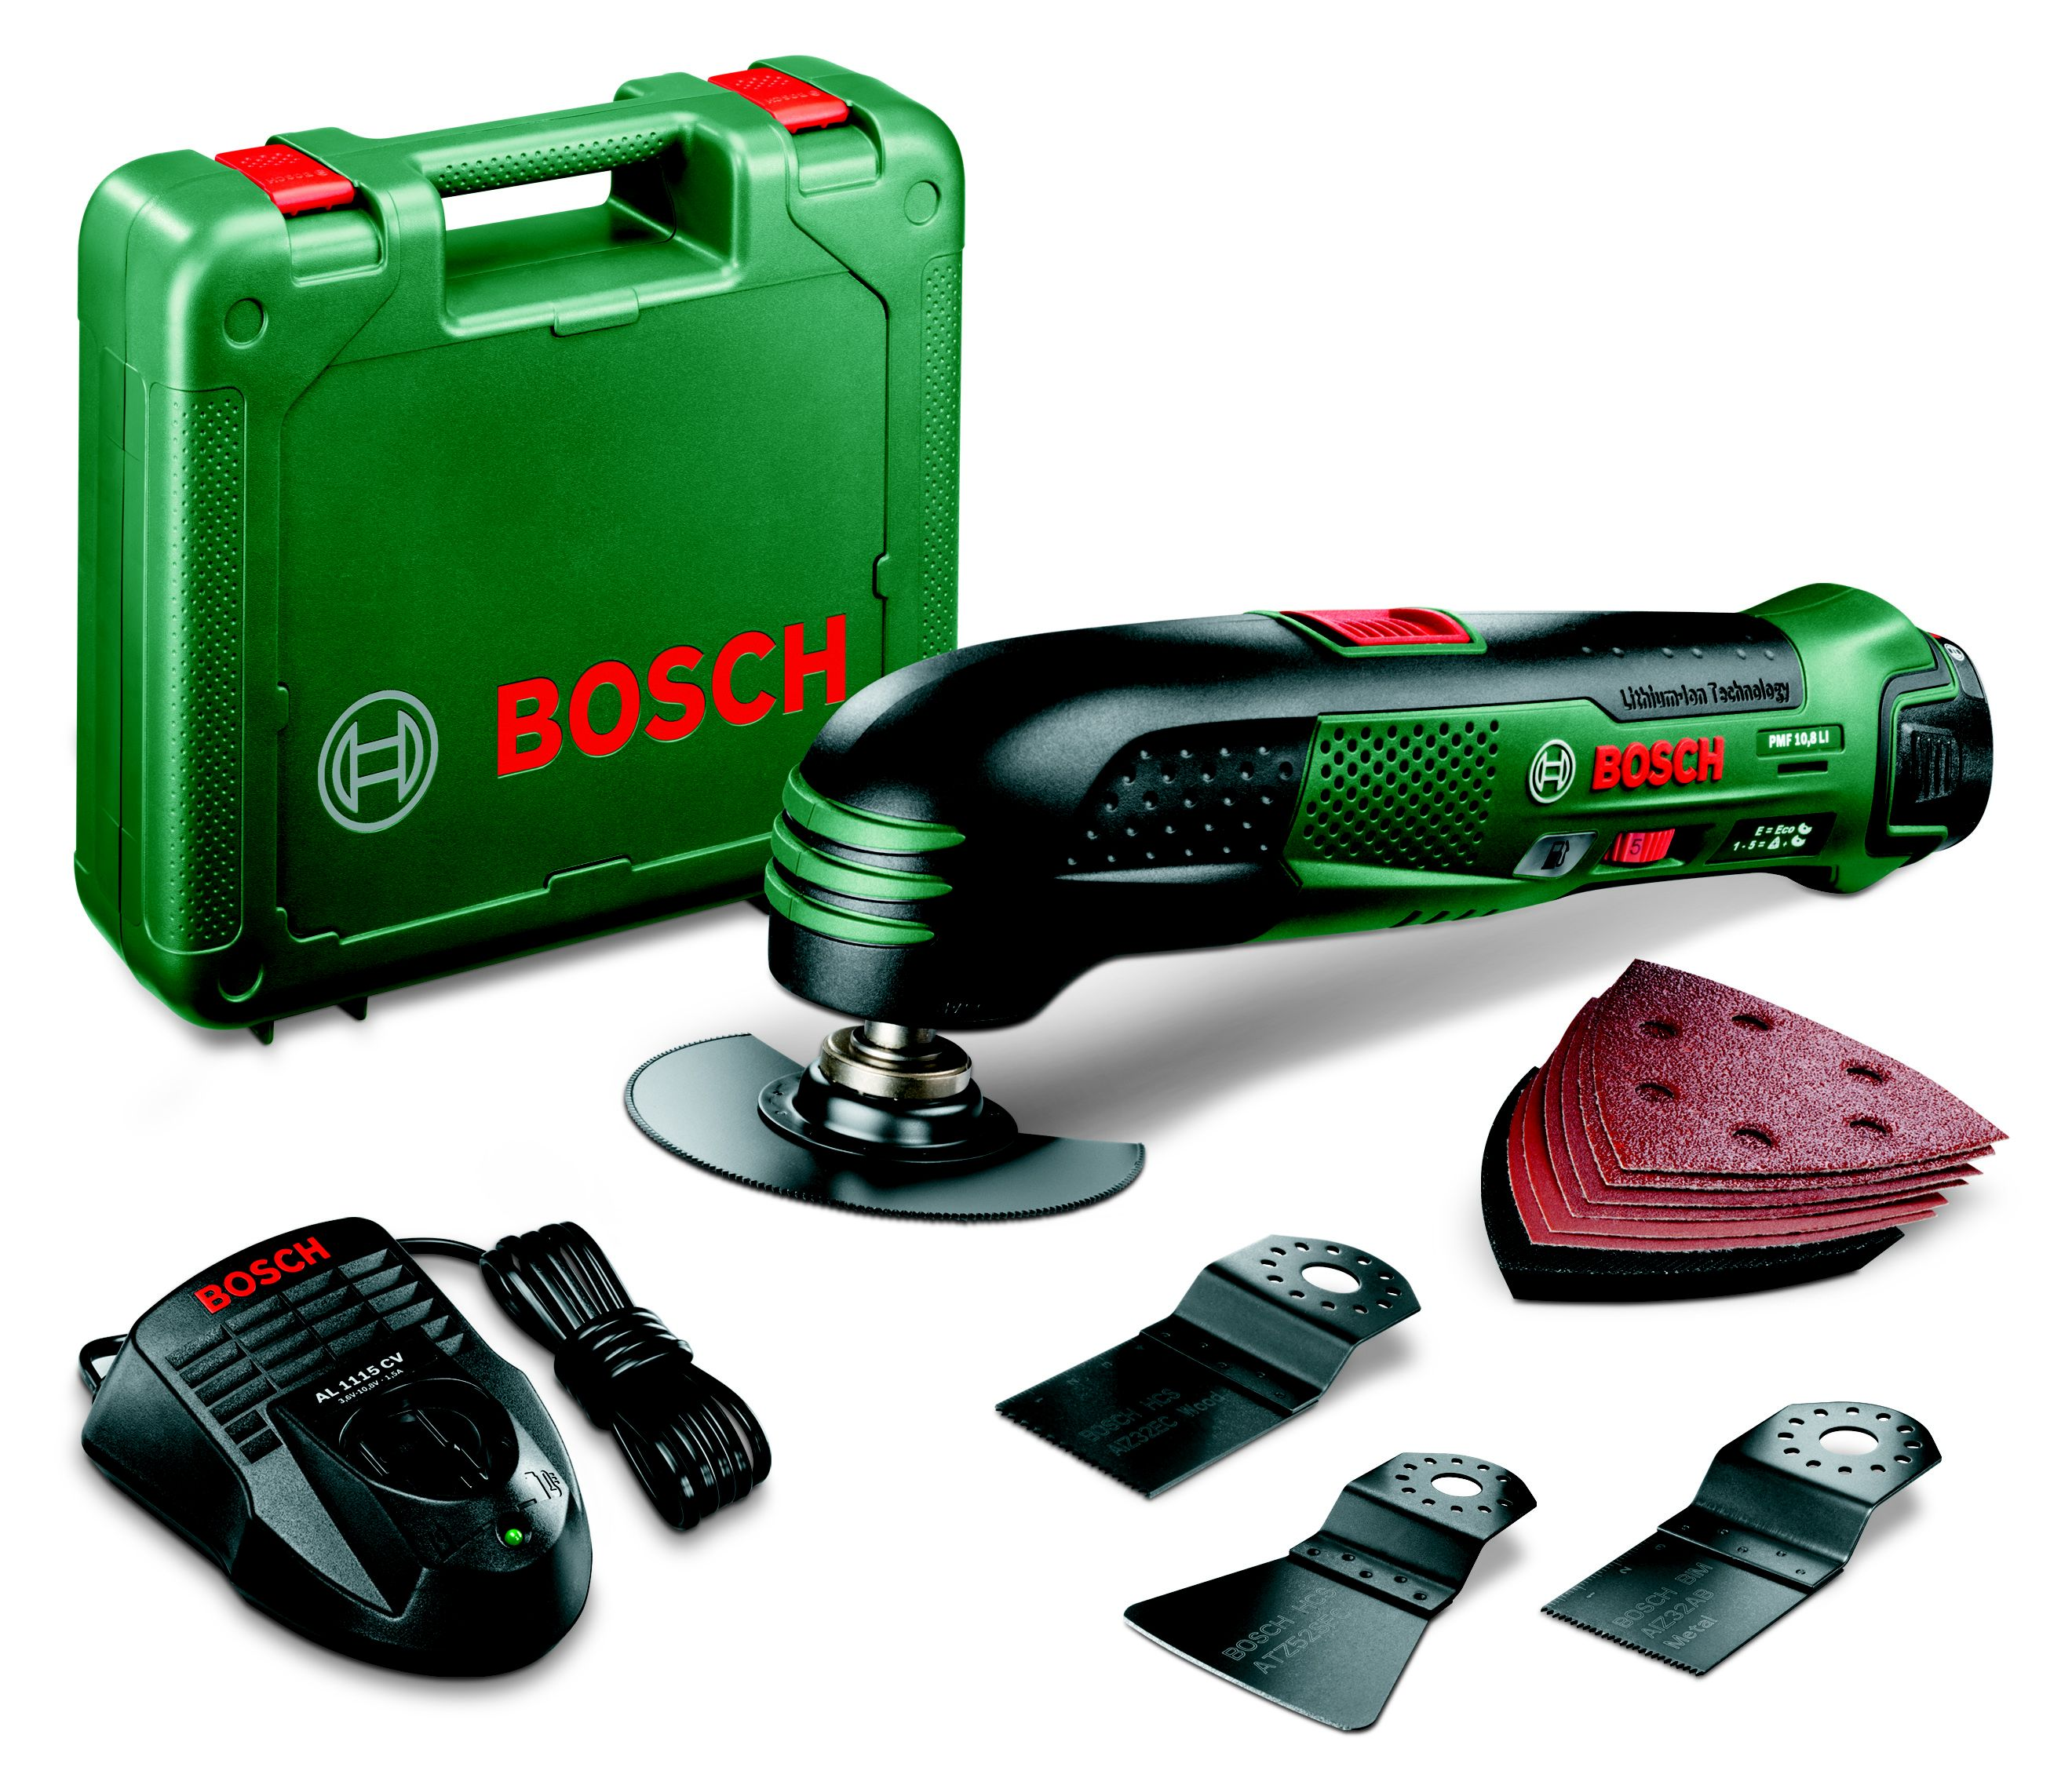 bosch cordless 10 8v multi tool set 1 battery pmf 10 8 li departments diy at b q. Black Bedroom Furniture Sets. Home Design Ideas